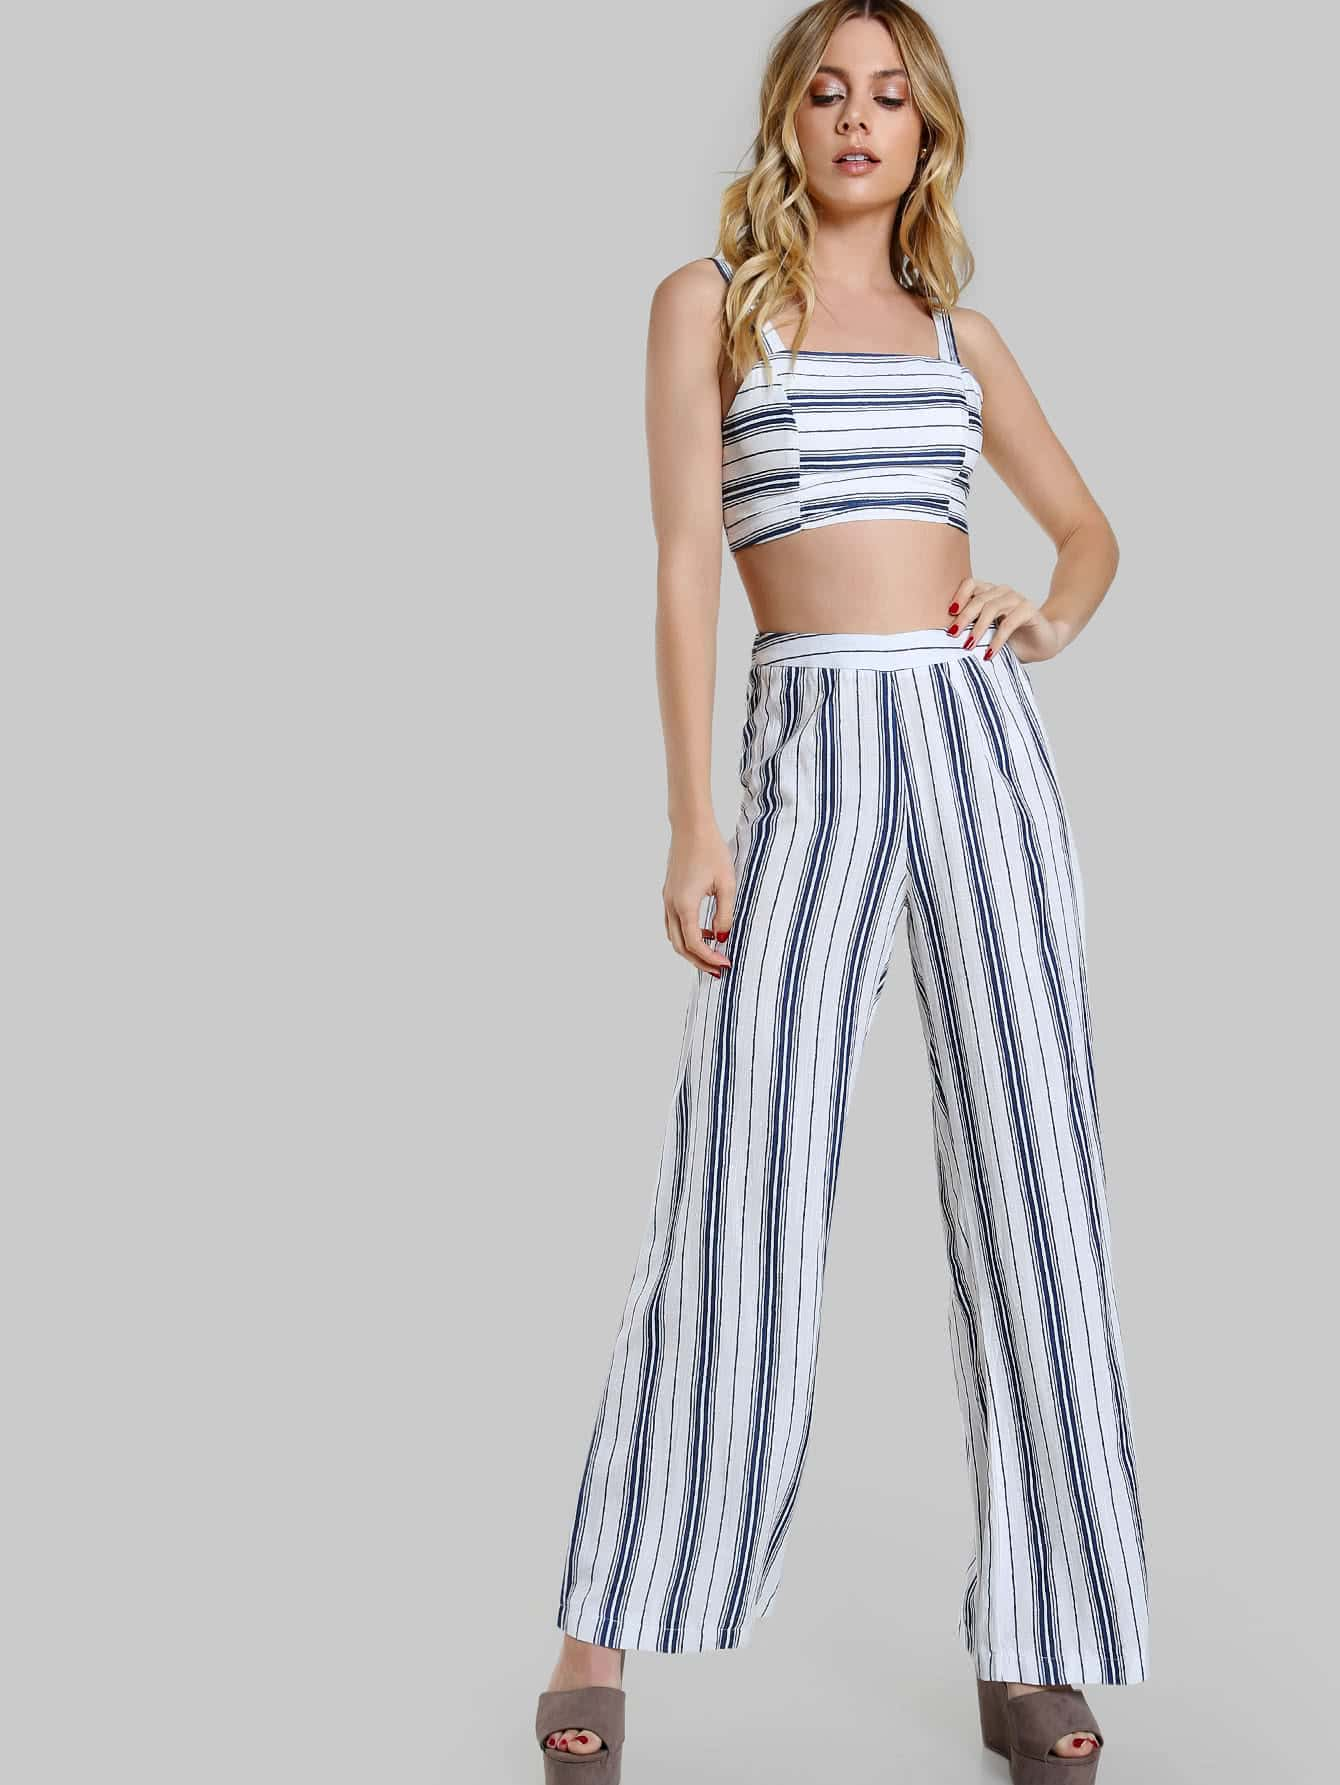 Striped Tank Lace Up Crop & Matching Pant Set -SheIn ...